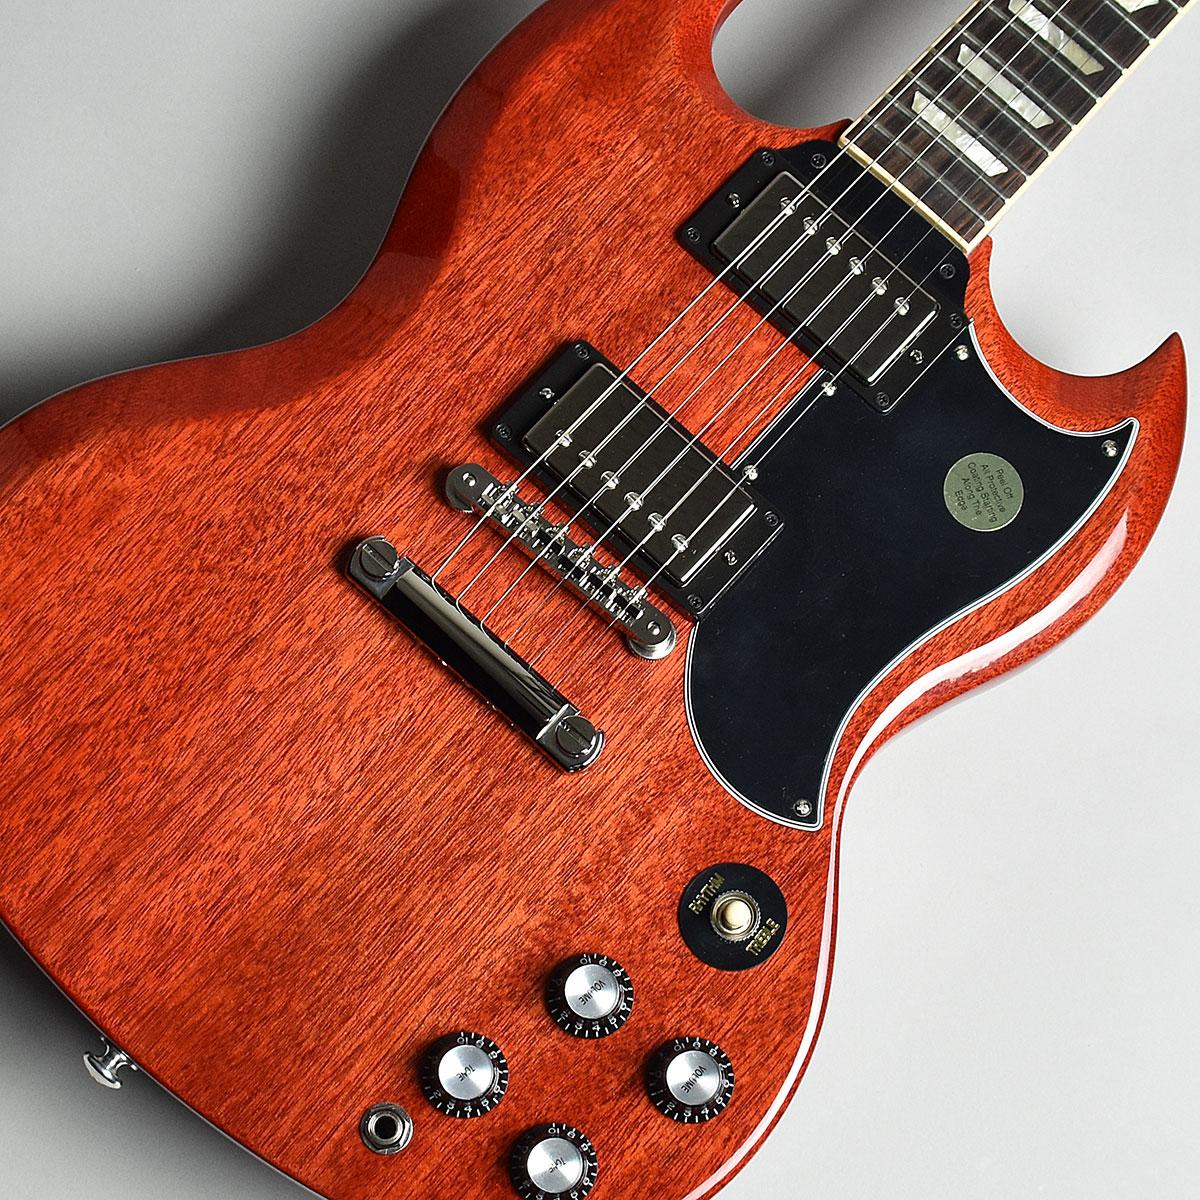 Gibson SG Standard '61 2019 Vintage Cherry S/N:190004443 【ギブソン SGスタンダード】【未展示品】